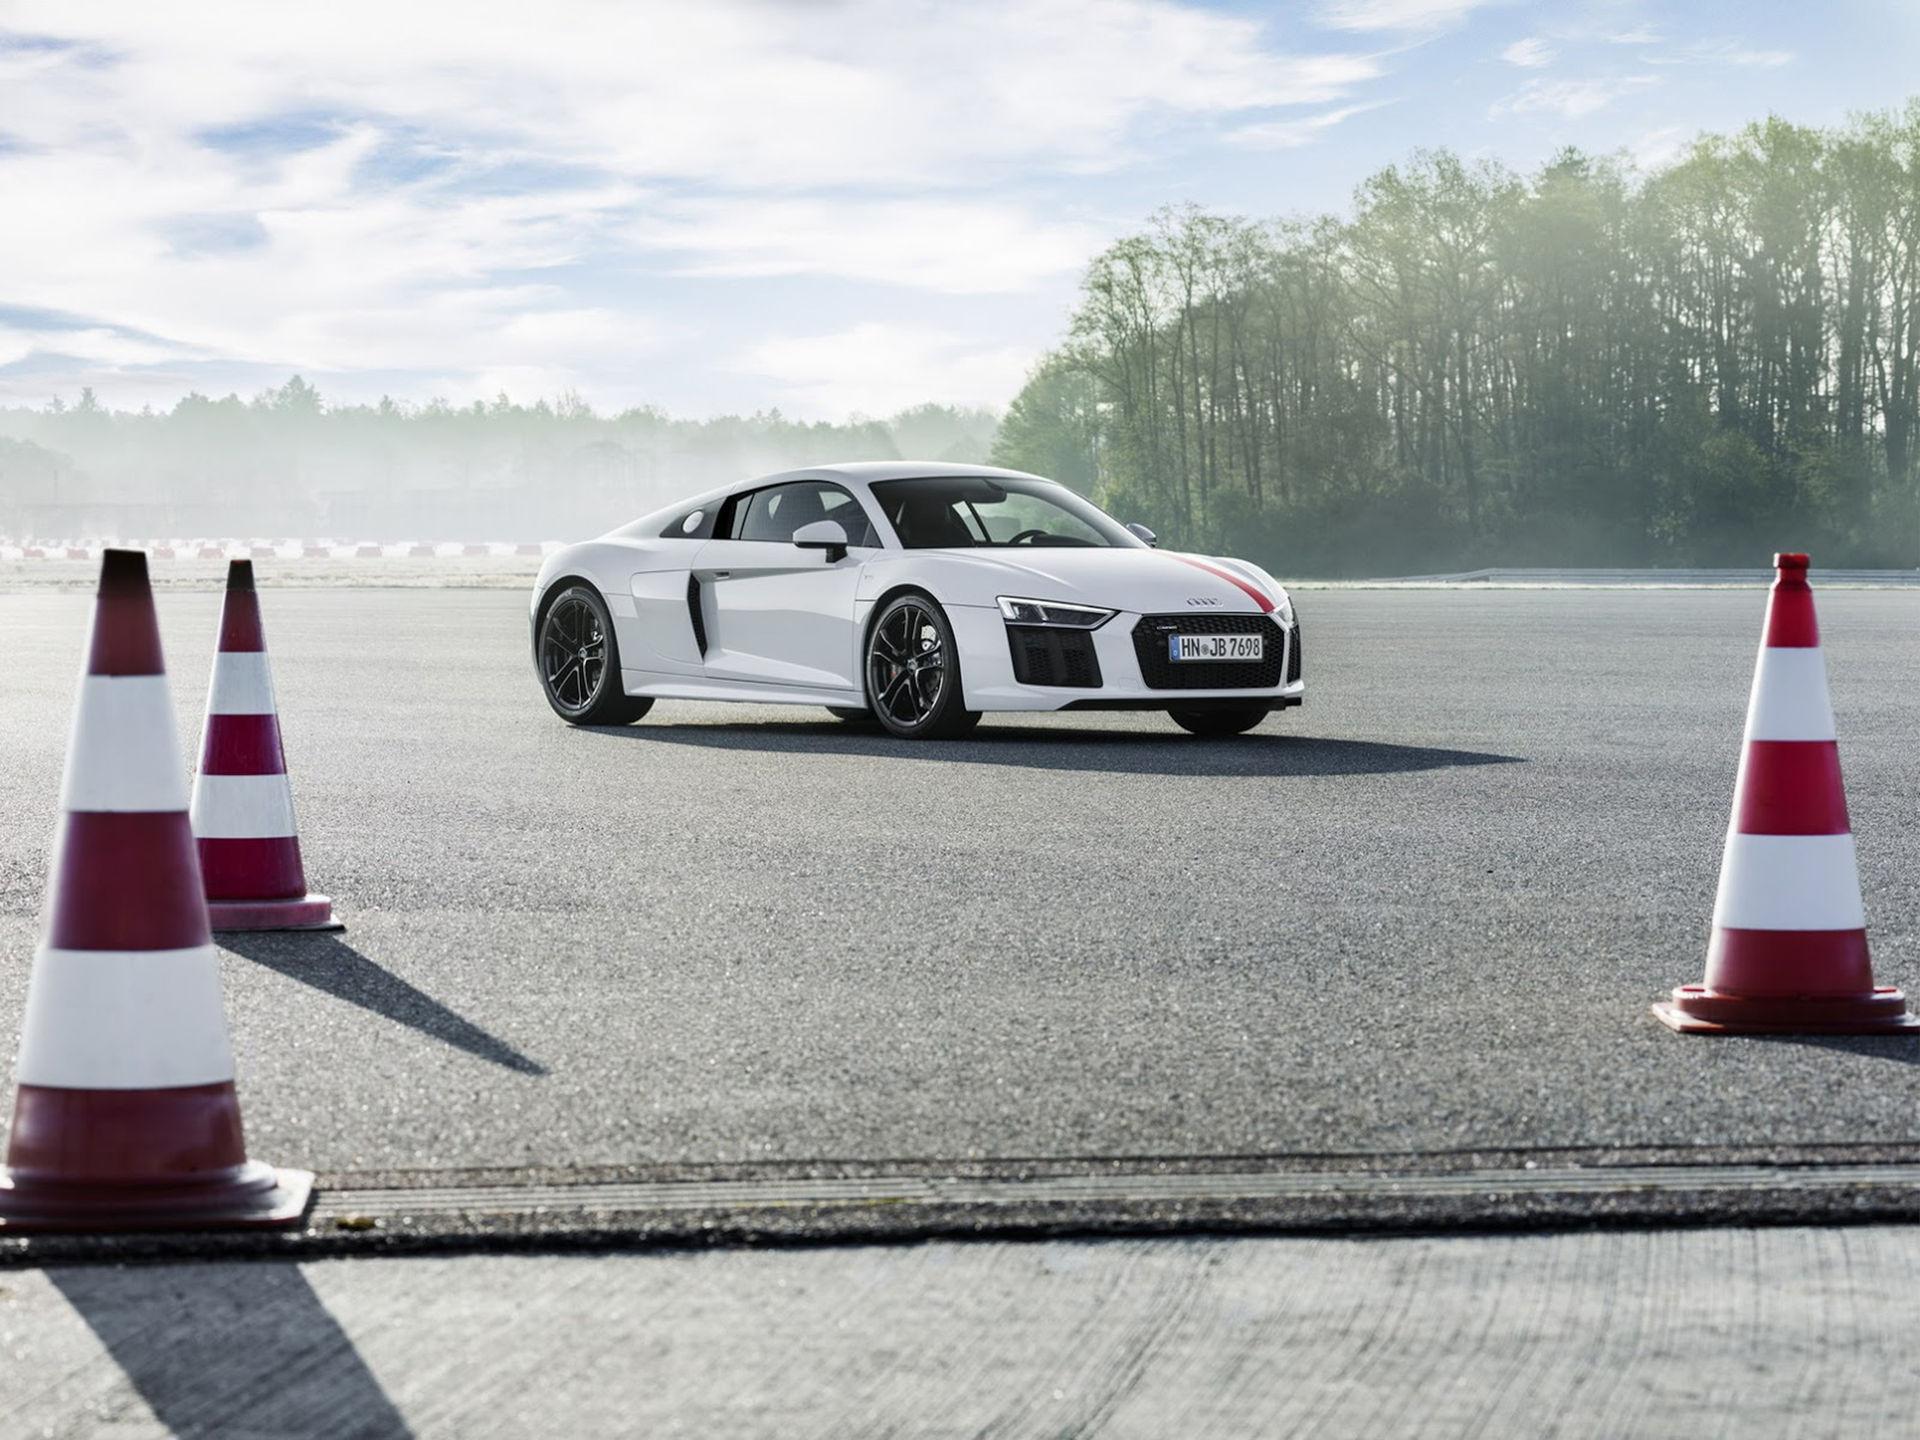 Nu finns Audi R8 med enbart bakhjulsdrift